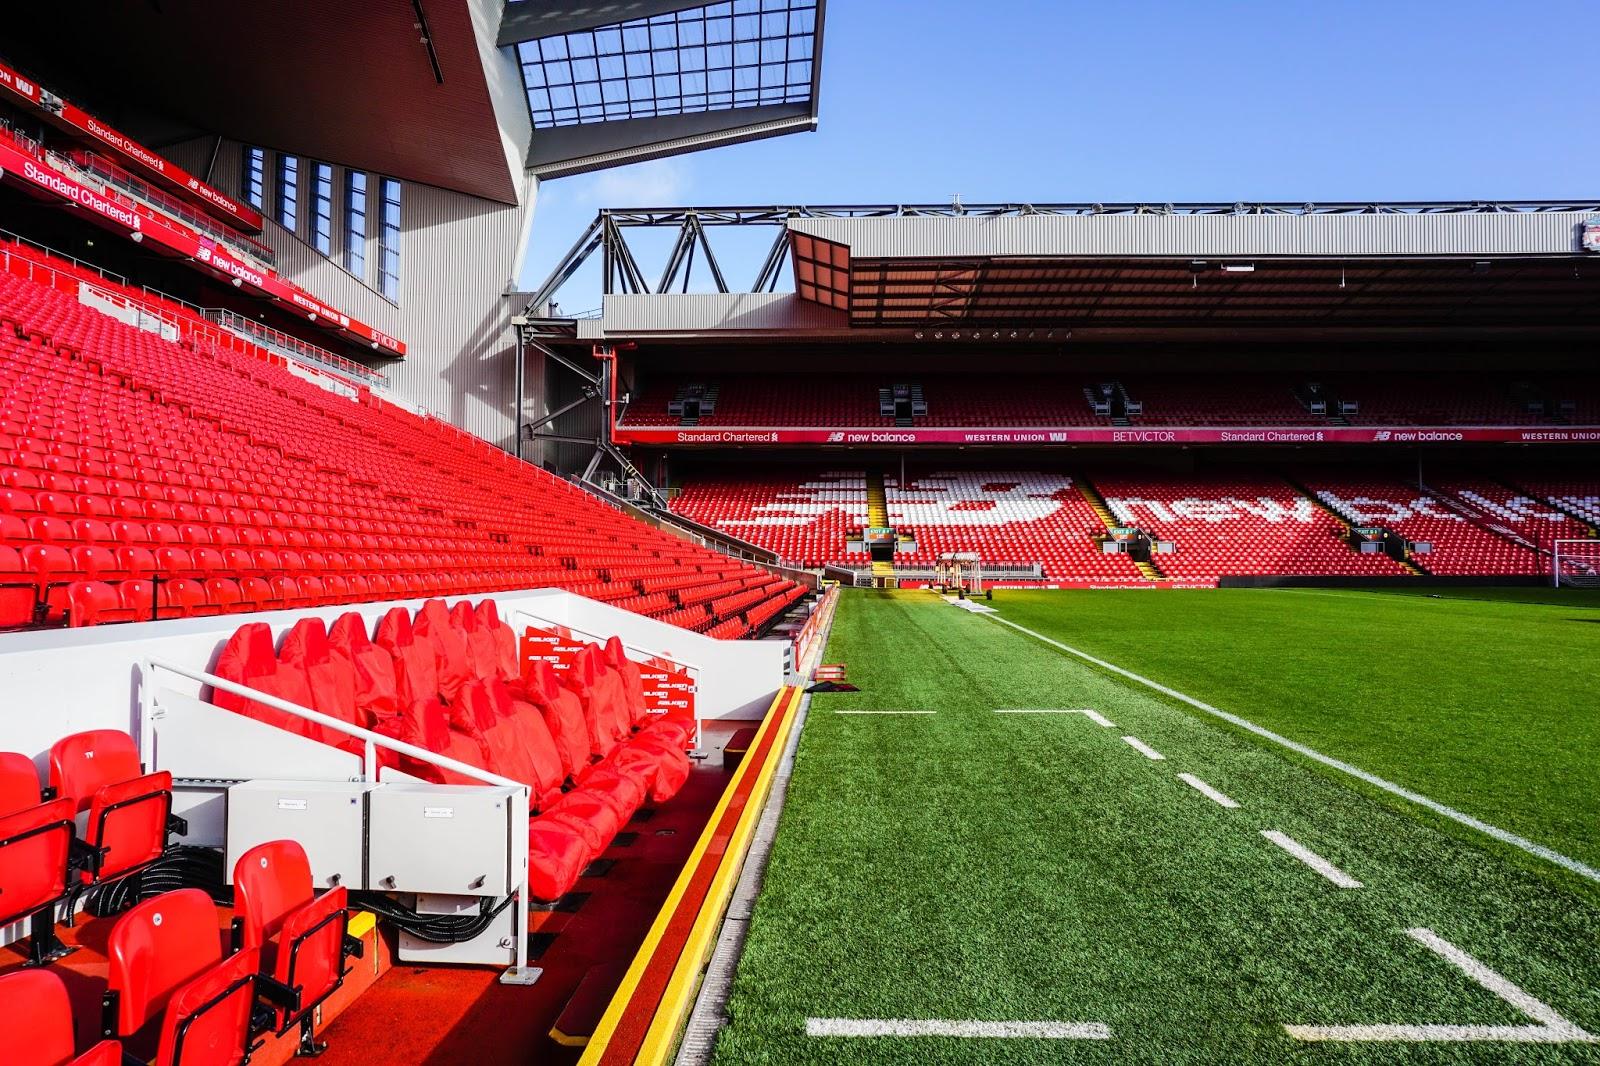 Zwiedzanie stadionu | Anfield | stadion Liverpool FC